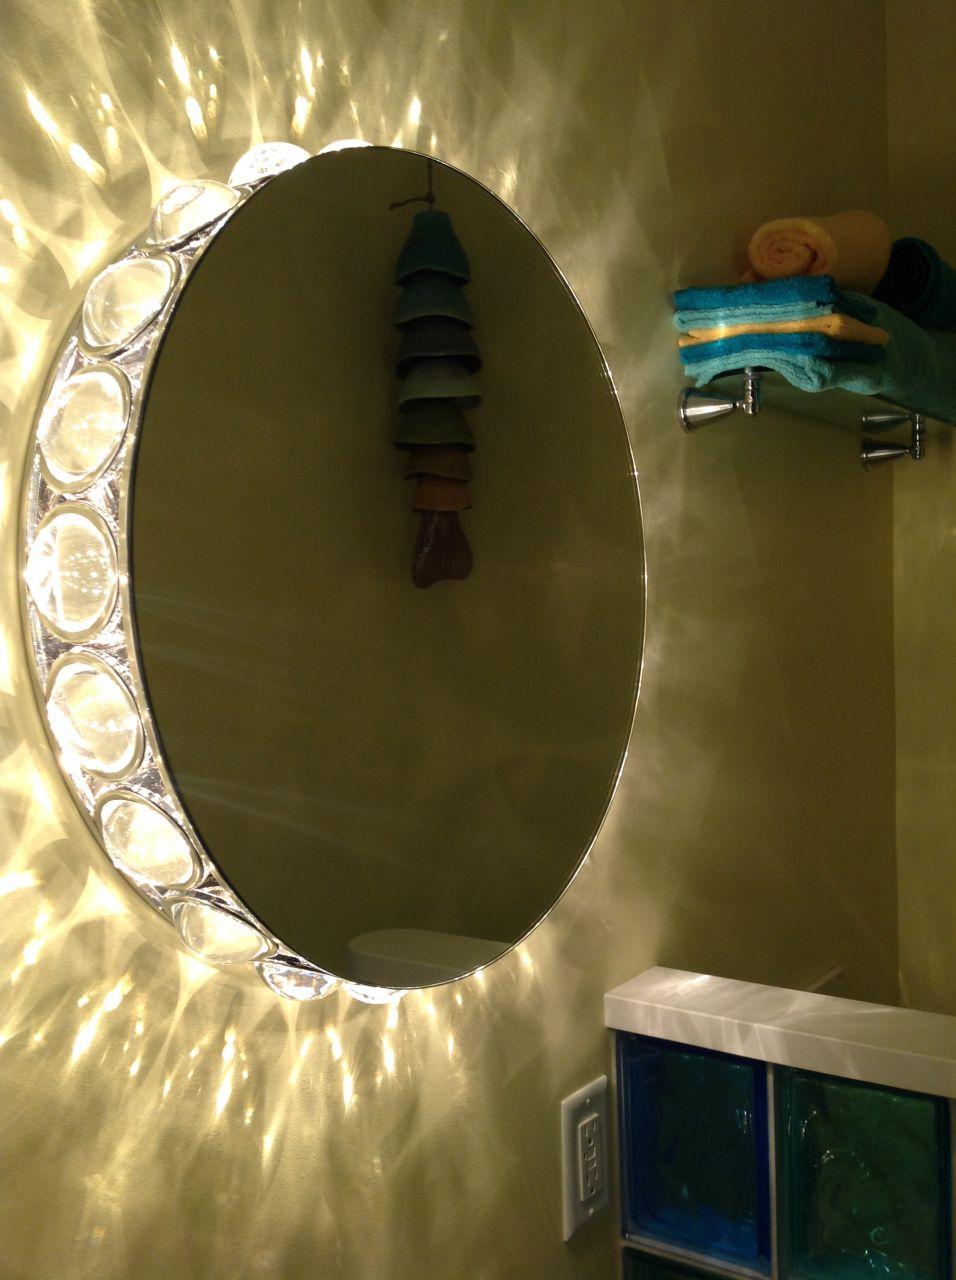 Bathroom occupied light - Bathroom Occupied Light Download